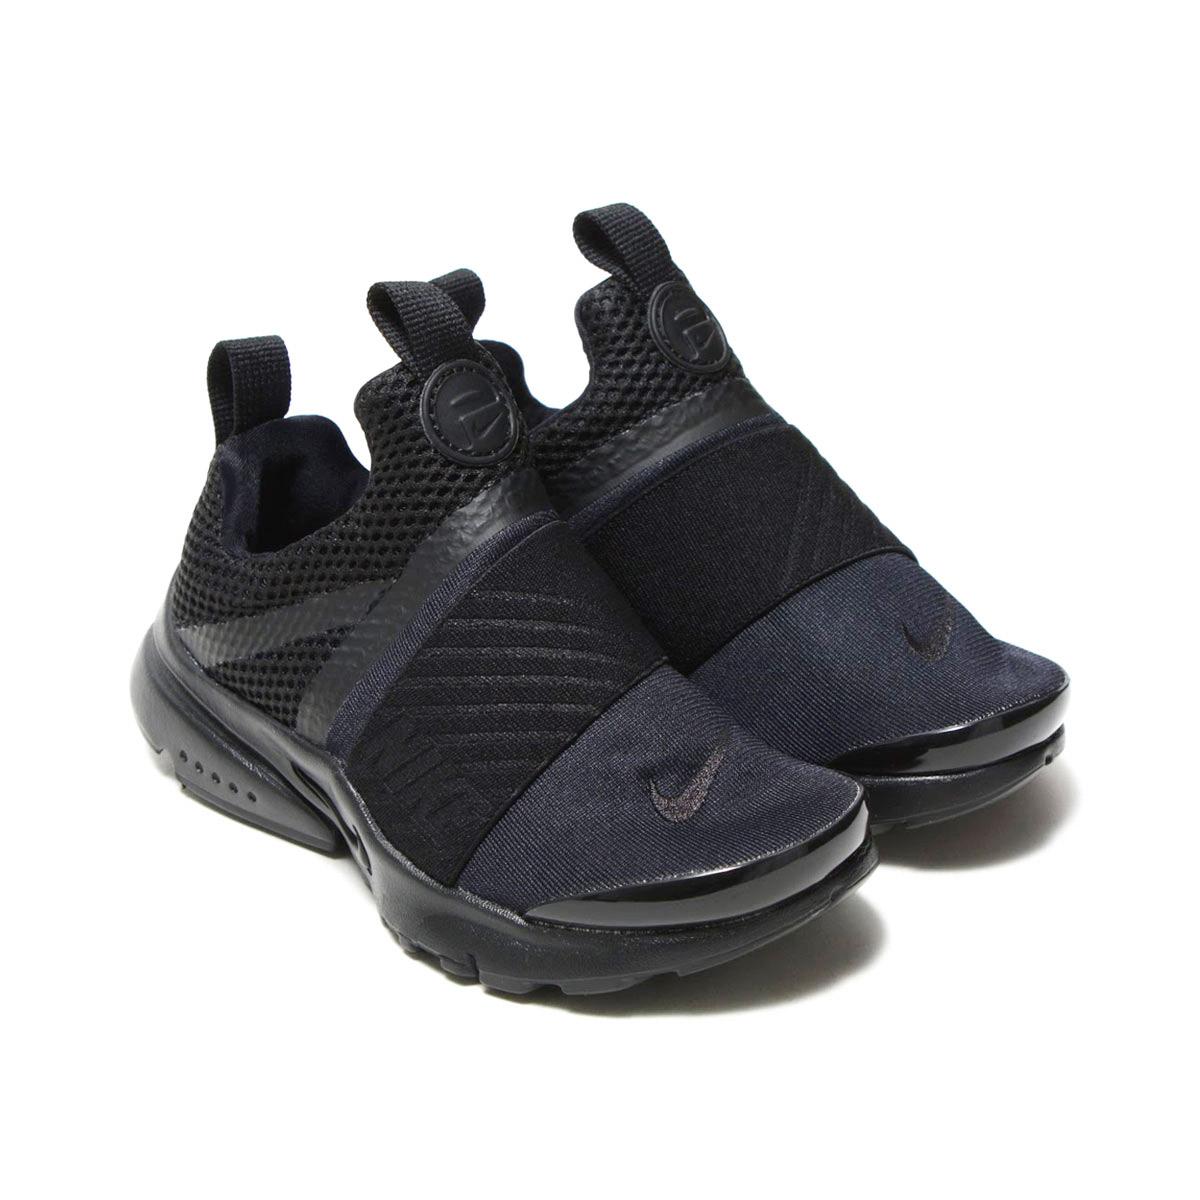 Black // Black 870023-001 Nike Presto Extreme Preschool Sneakers